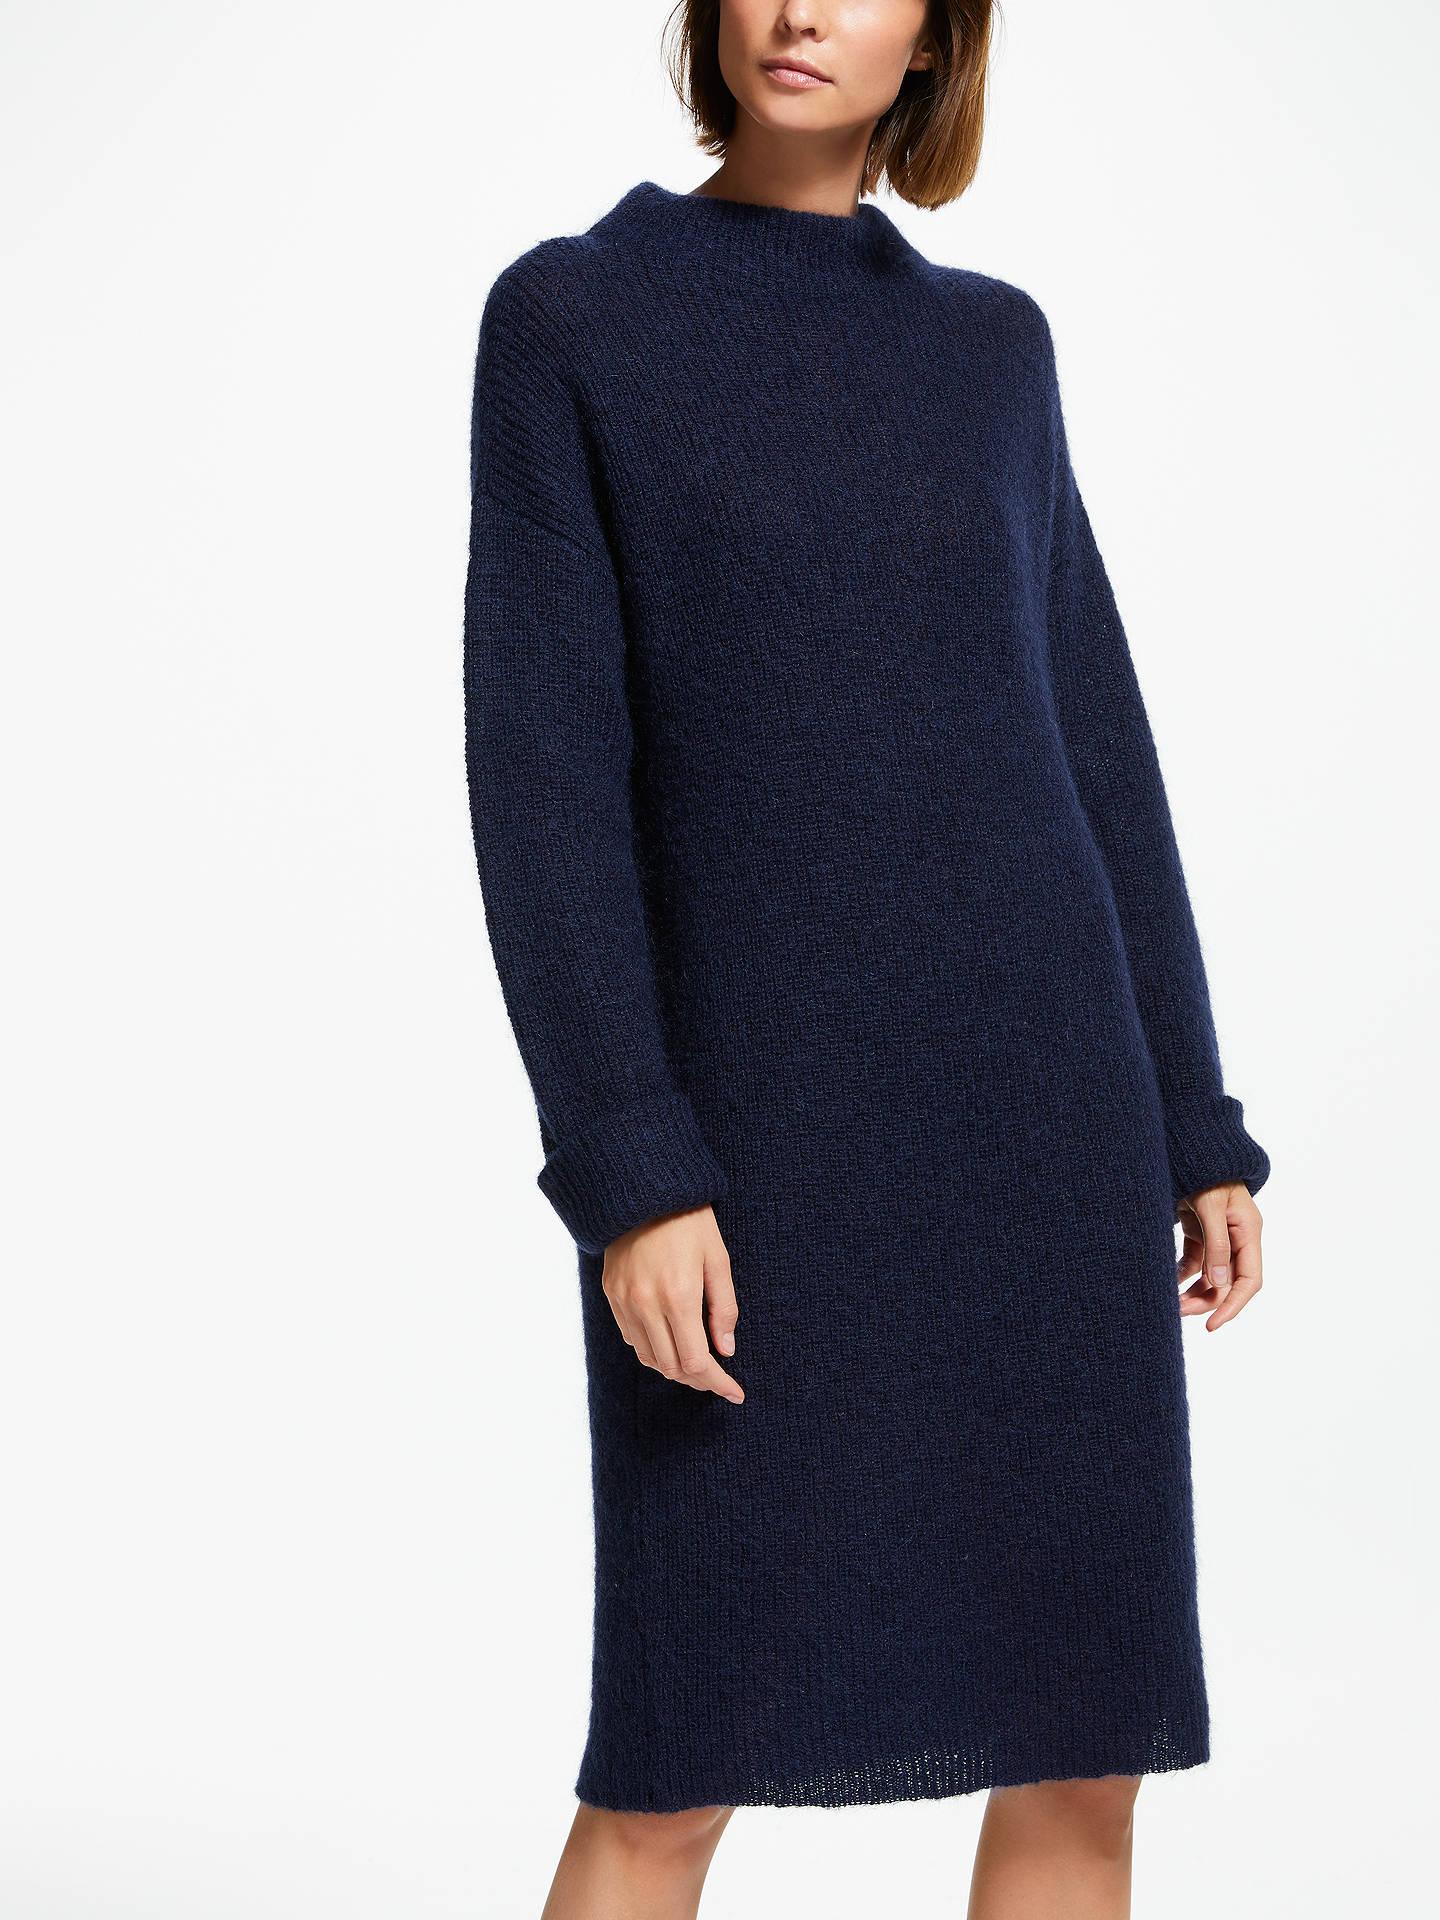 latest sale modern design beautiful style Finery Cypress Jumper Dress, Blue Navy at John Lewis & Partners